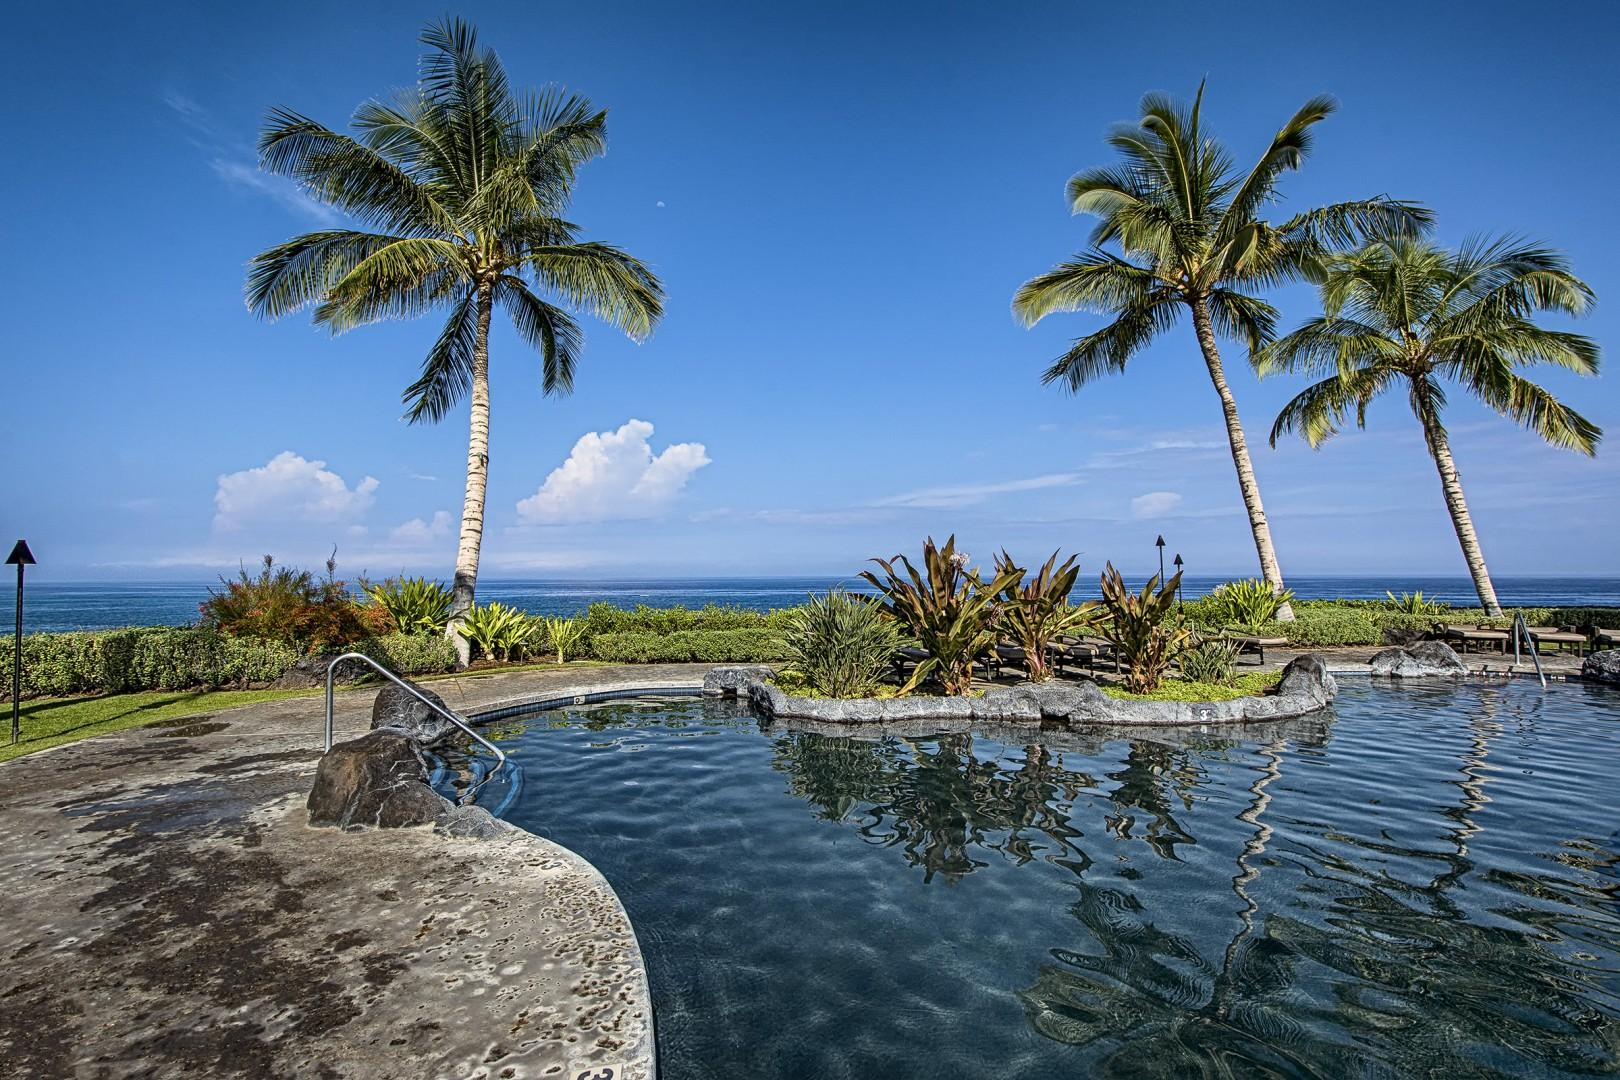 Beautiful nearby pool at the Hali'i Kai.